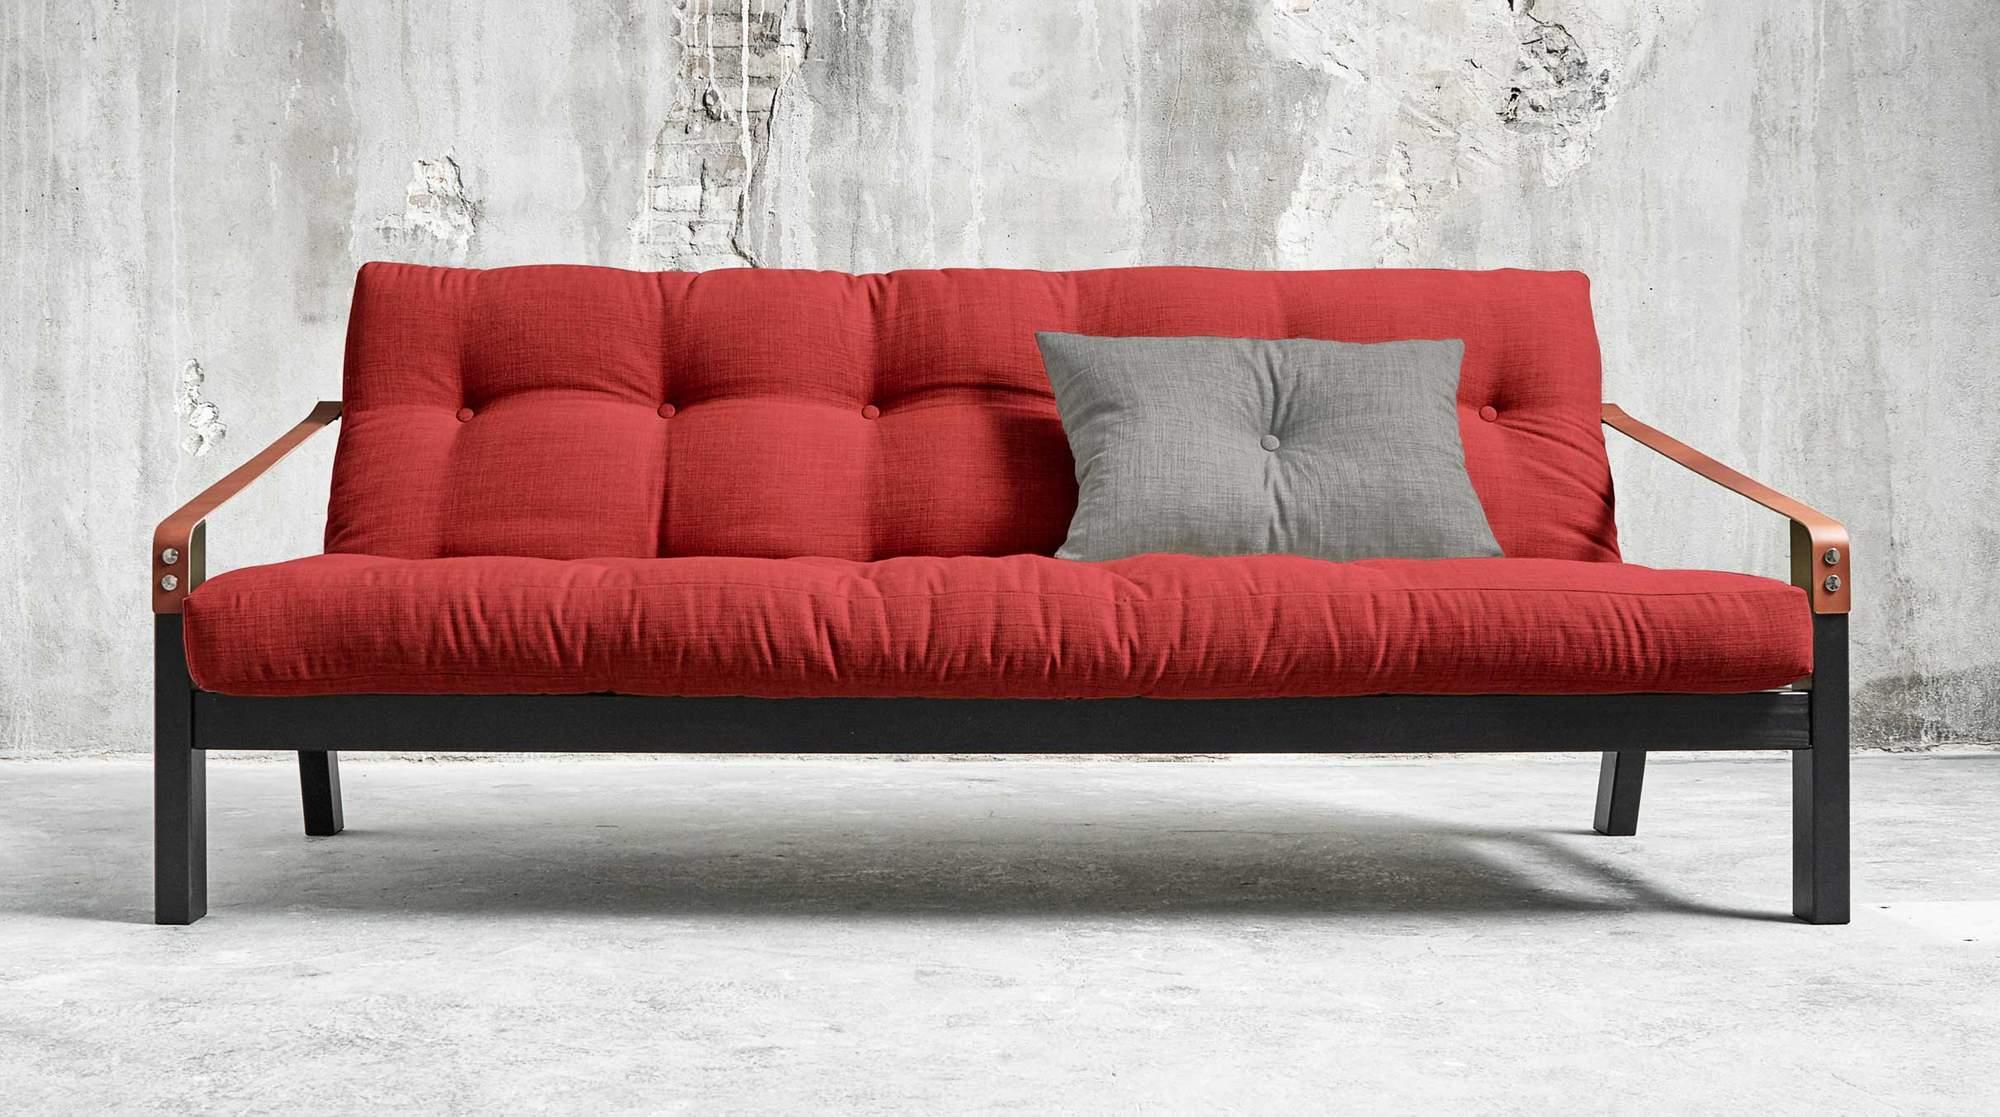 schlafsofa poetry kiefer schwarz sofa mit klappbarer r ckenlehne. Black Bedroom Furniture Sets. Home Design Ideas